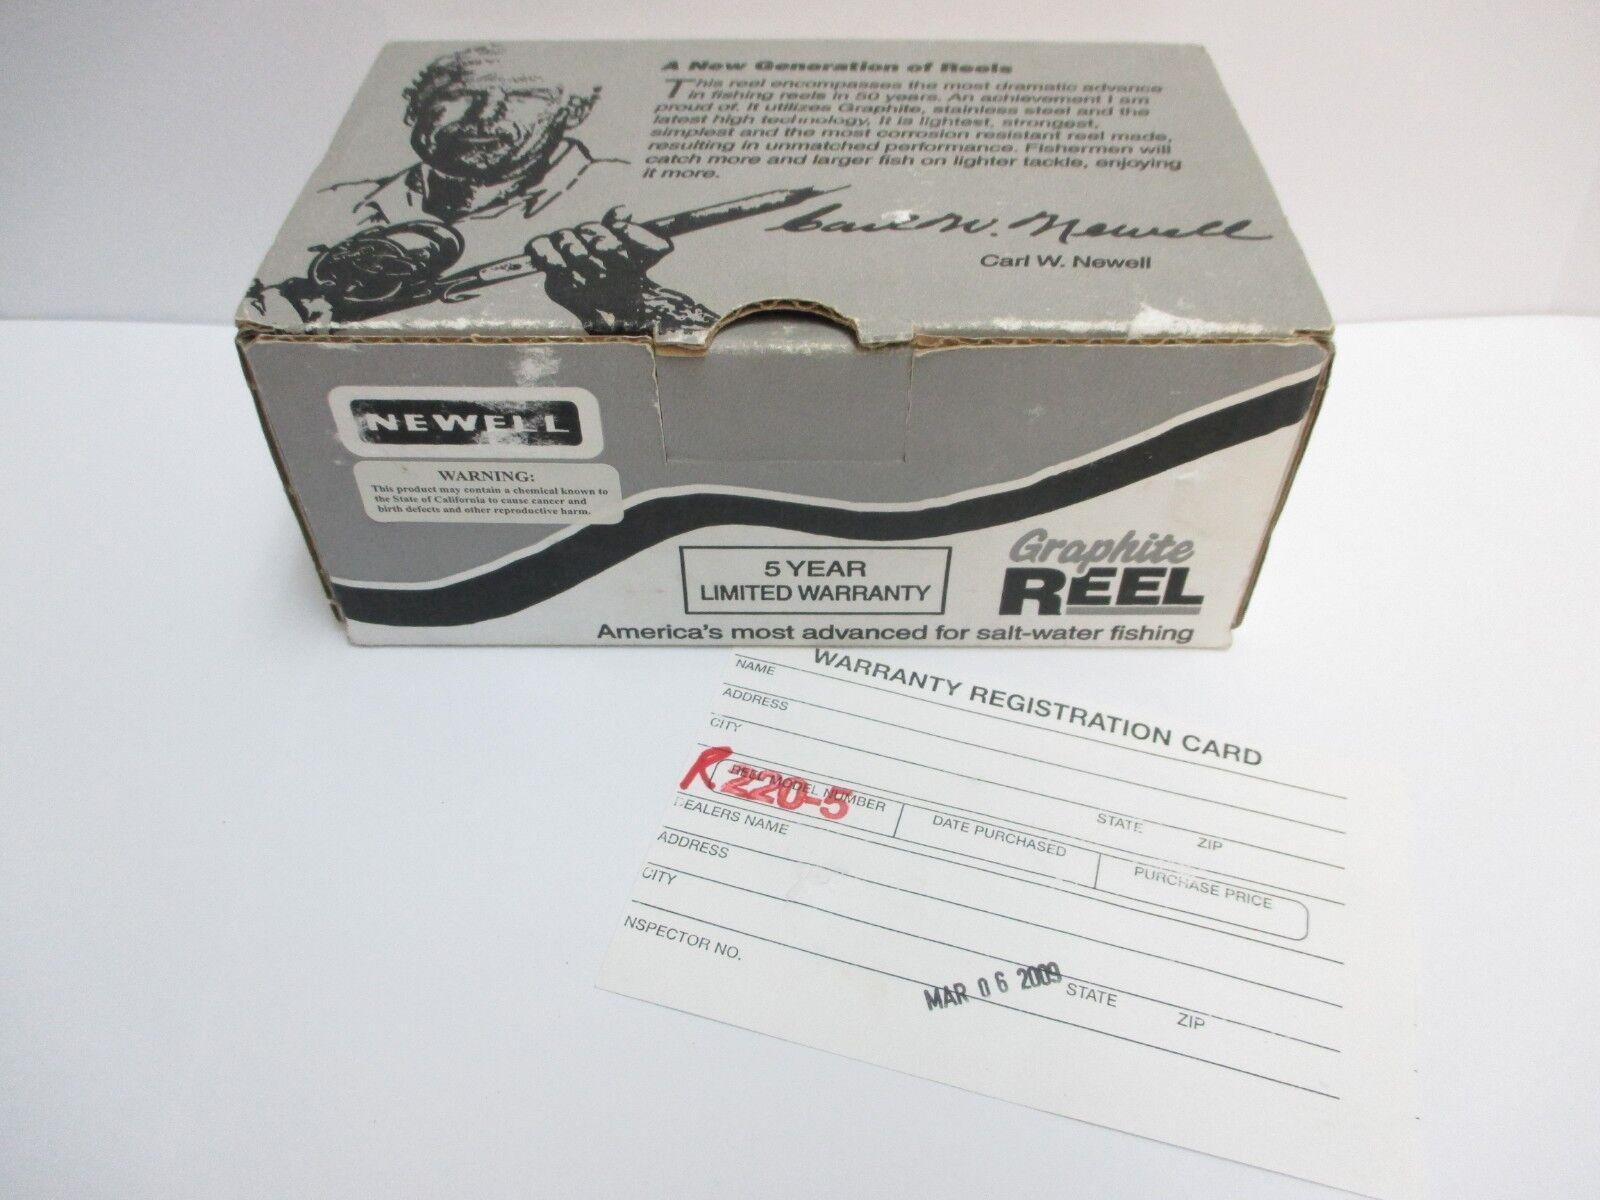 NEWELL - R220-5 Graphite - Reel Box w  Brochure